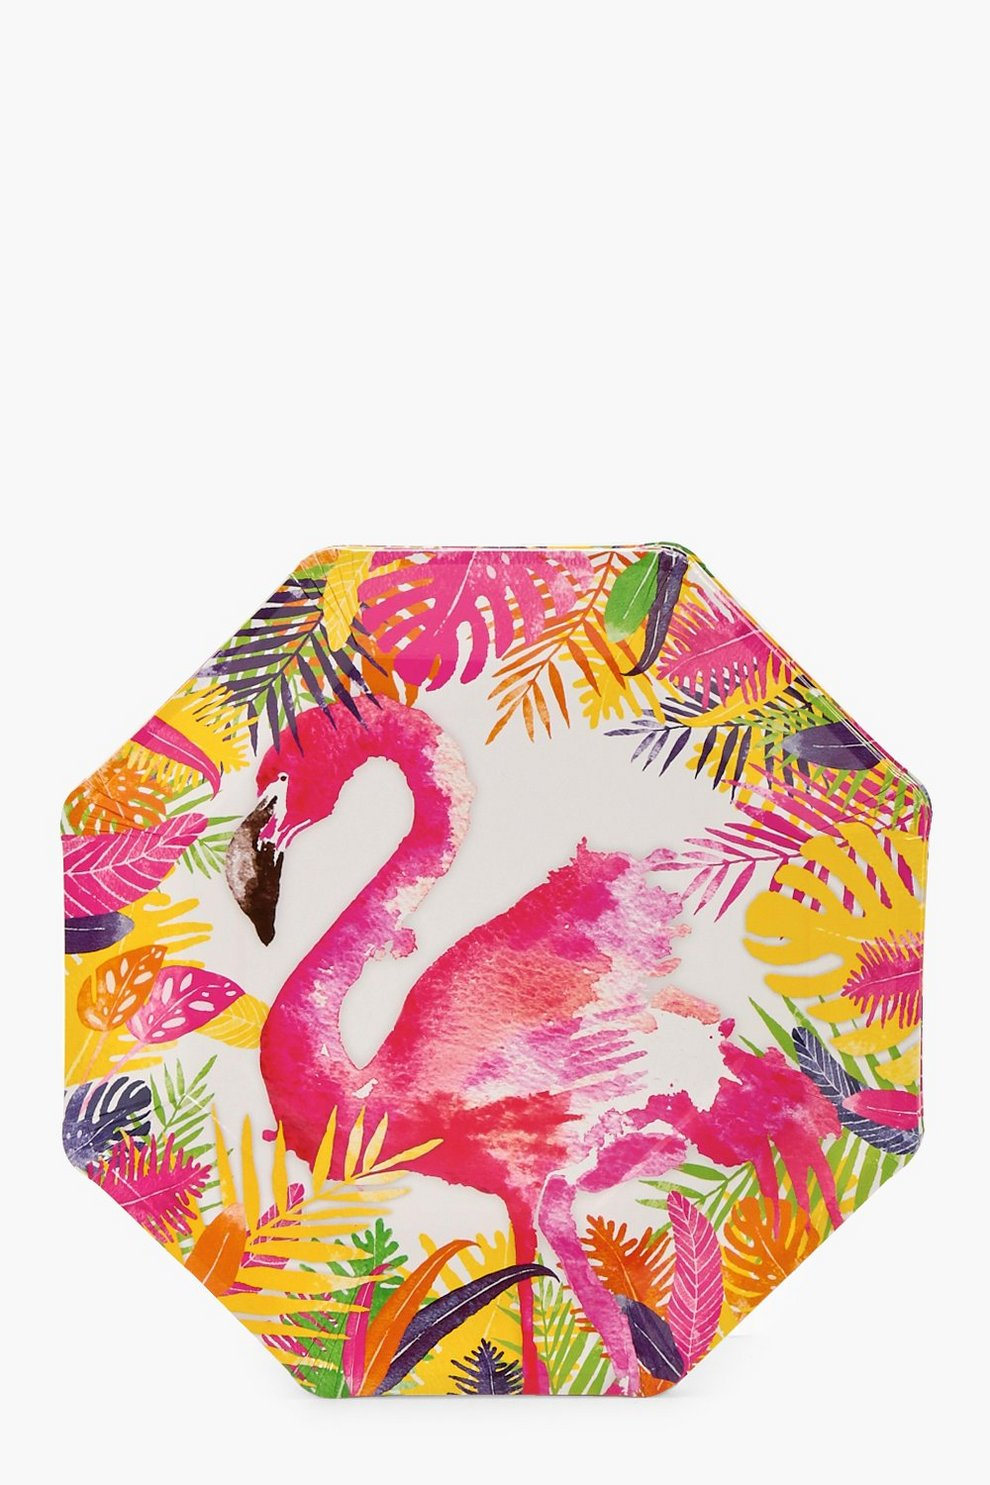 Flamingo Paper Plates & Flamingo Paper Plates | Boohoo